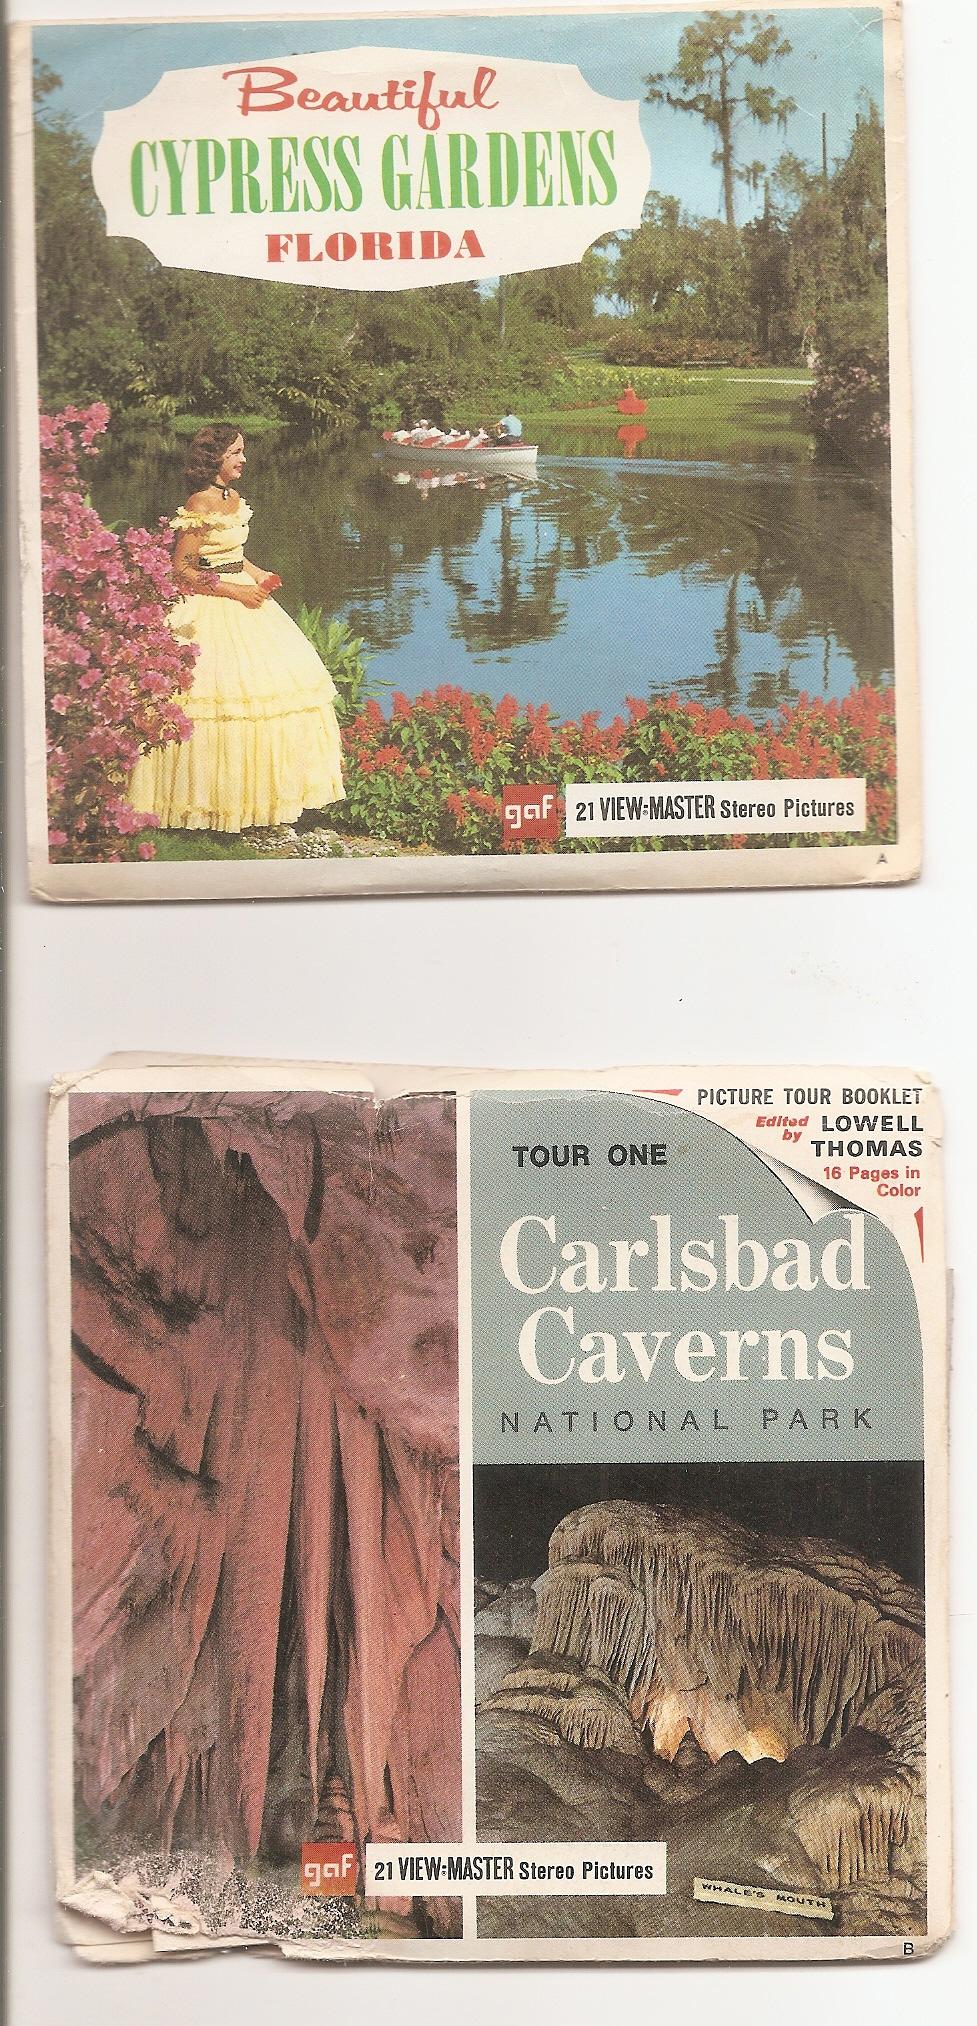 2 Sets A376 Carlsbad Caverns Cypress Gardens On Storenvy